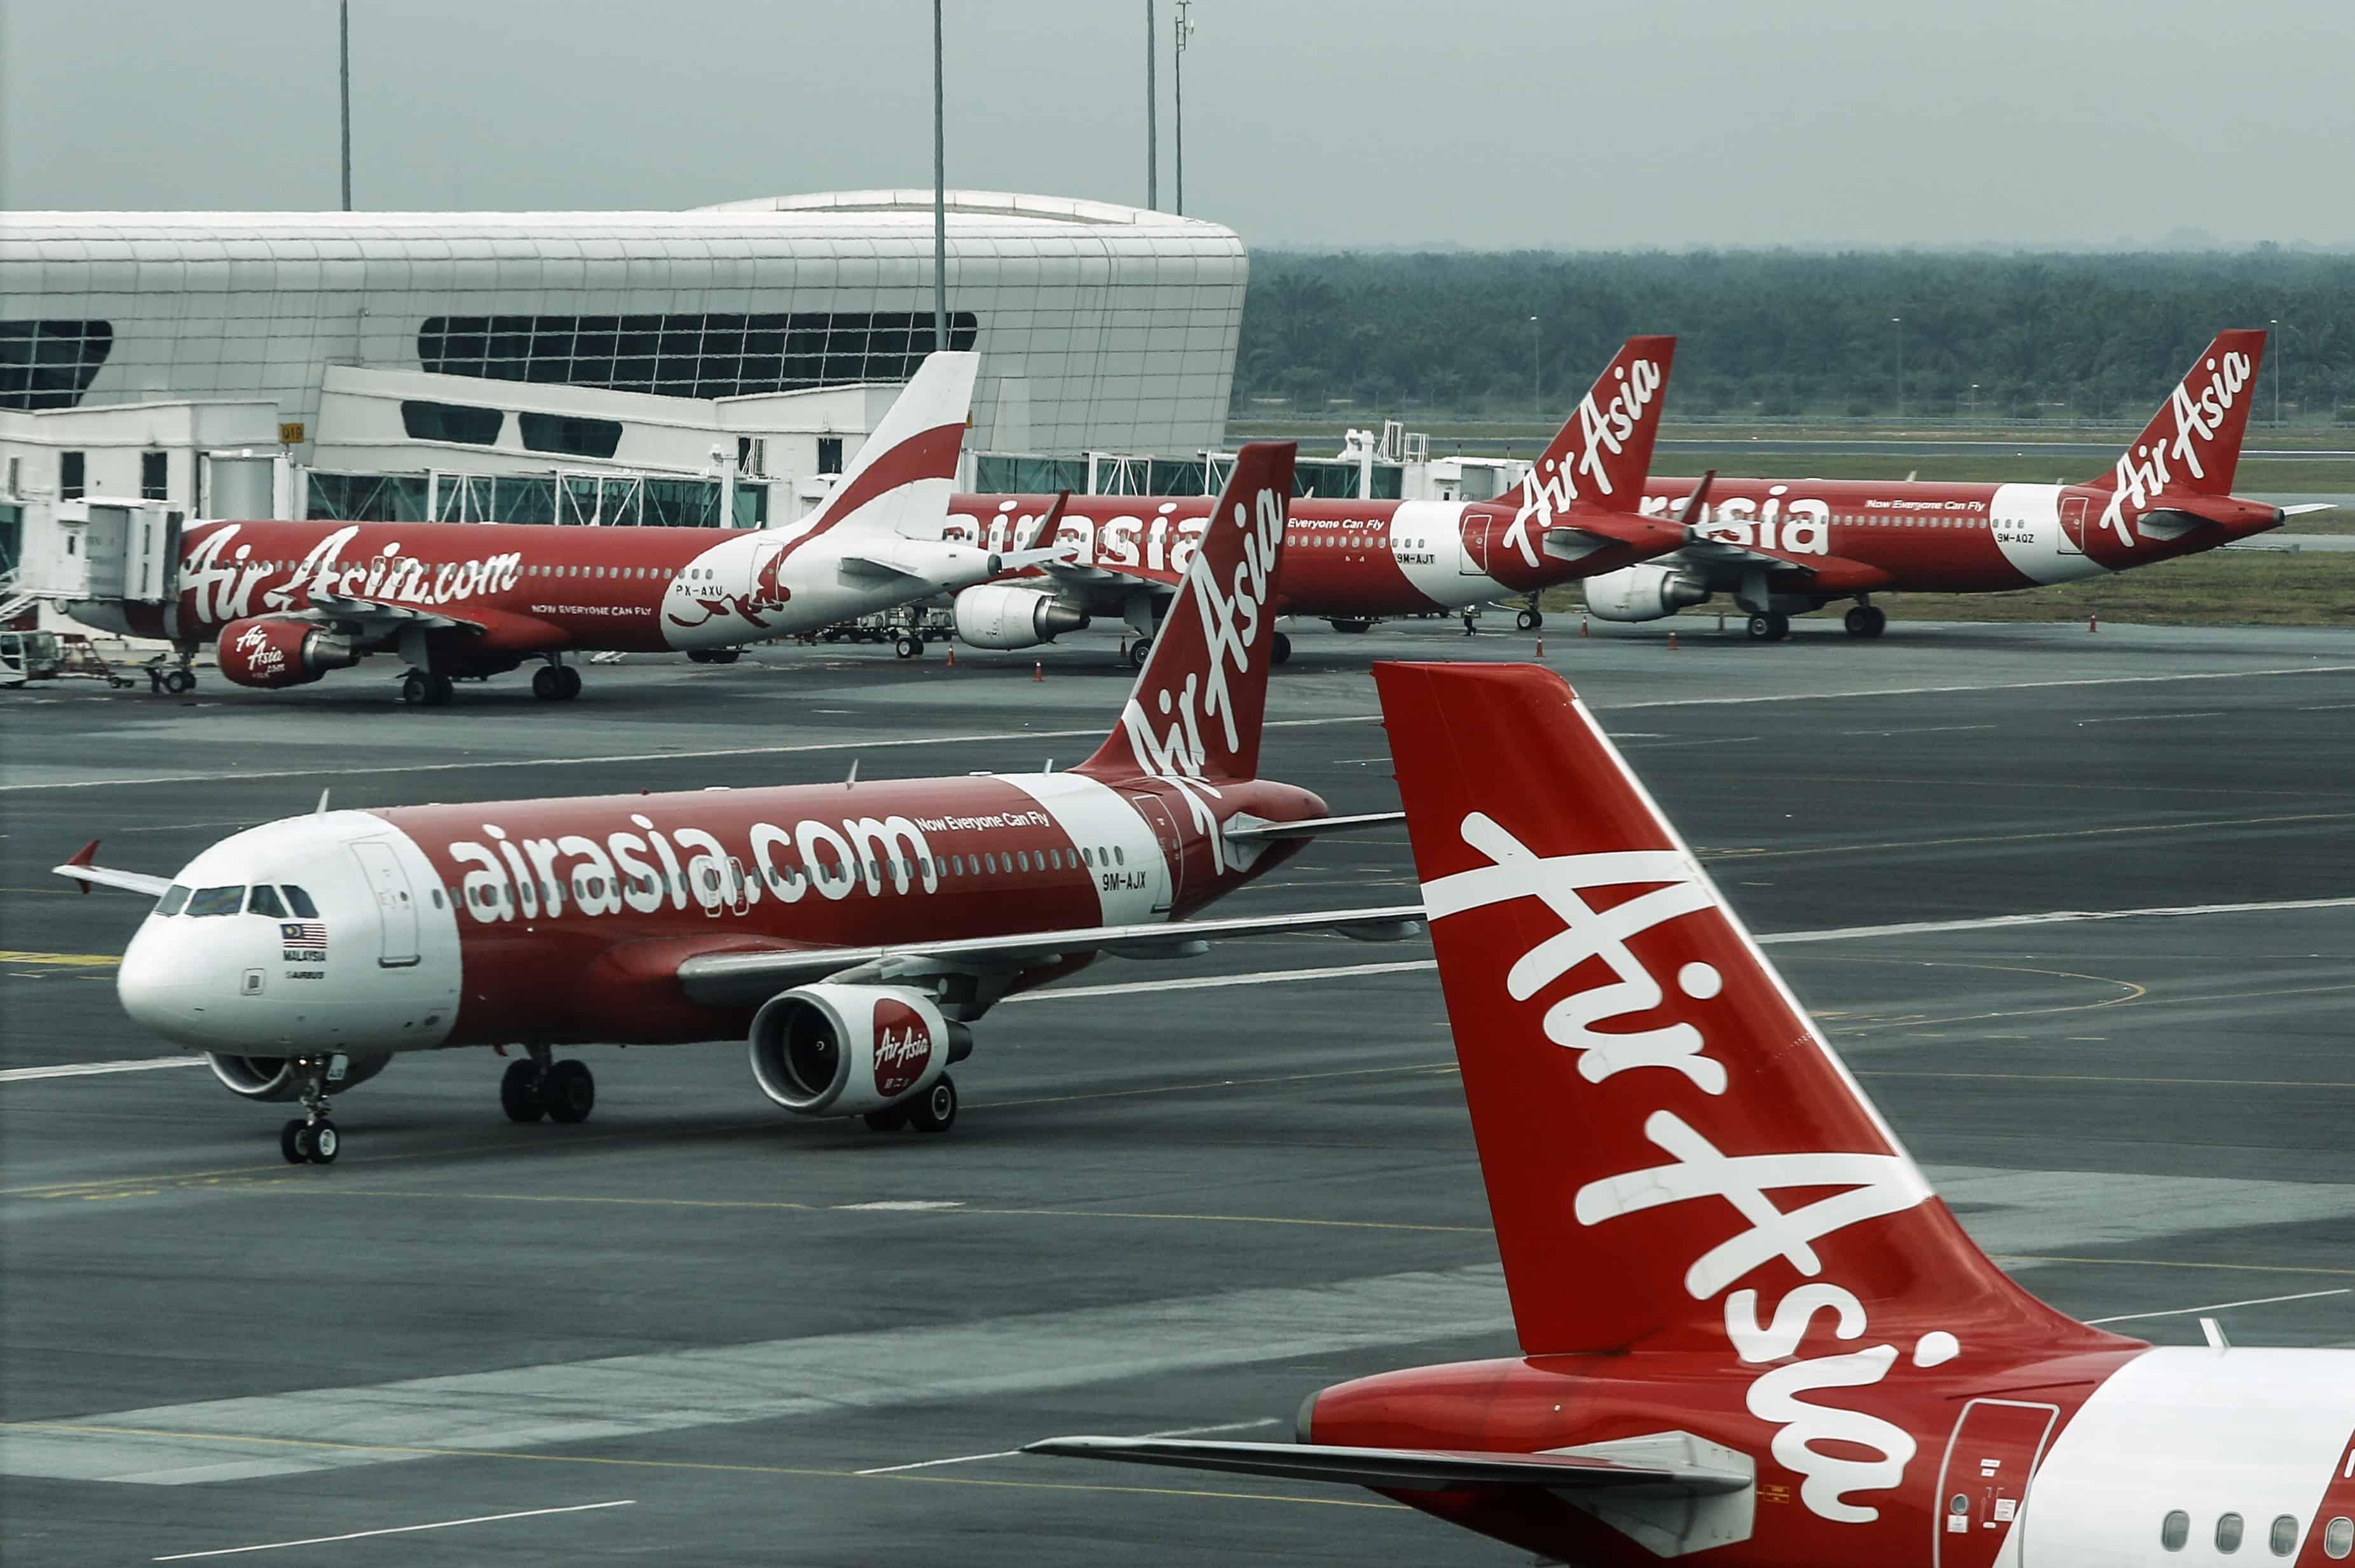 Verschillende vliegtuigen van AirAsia